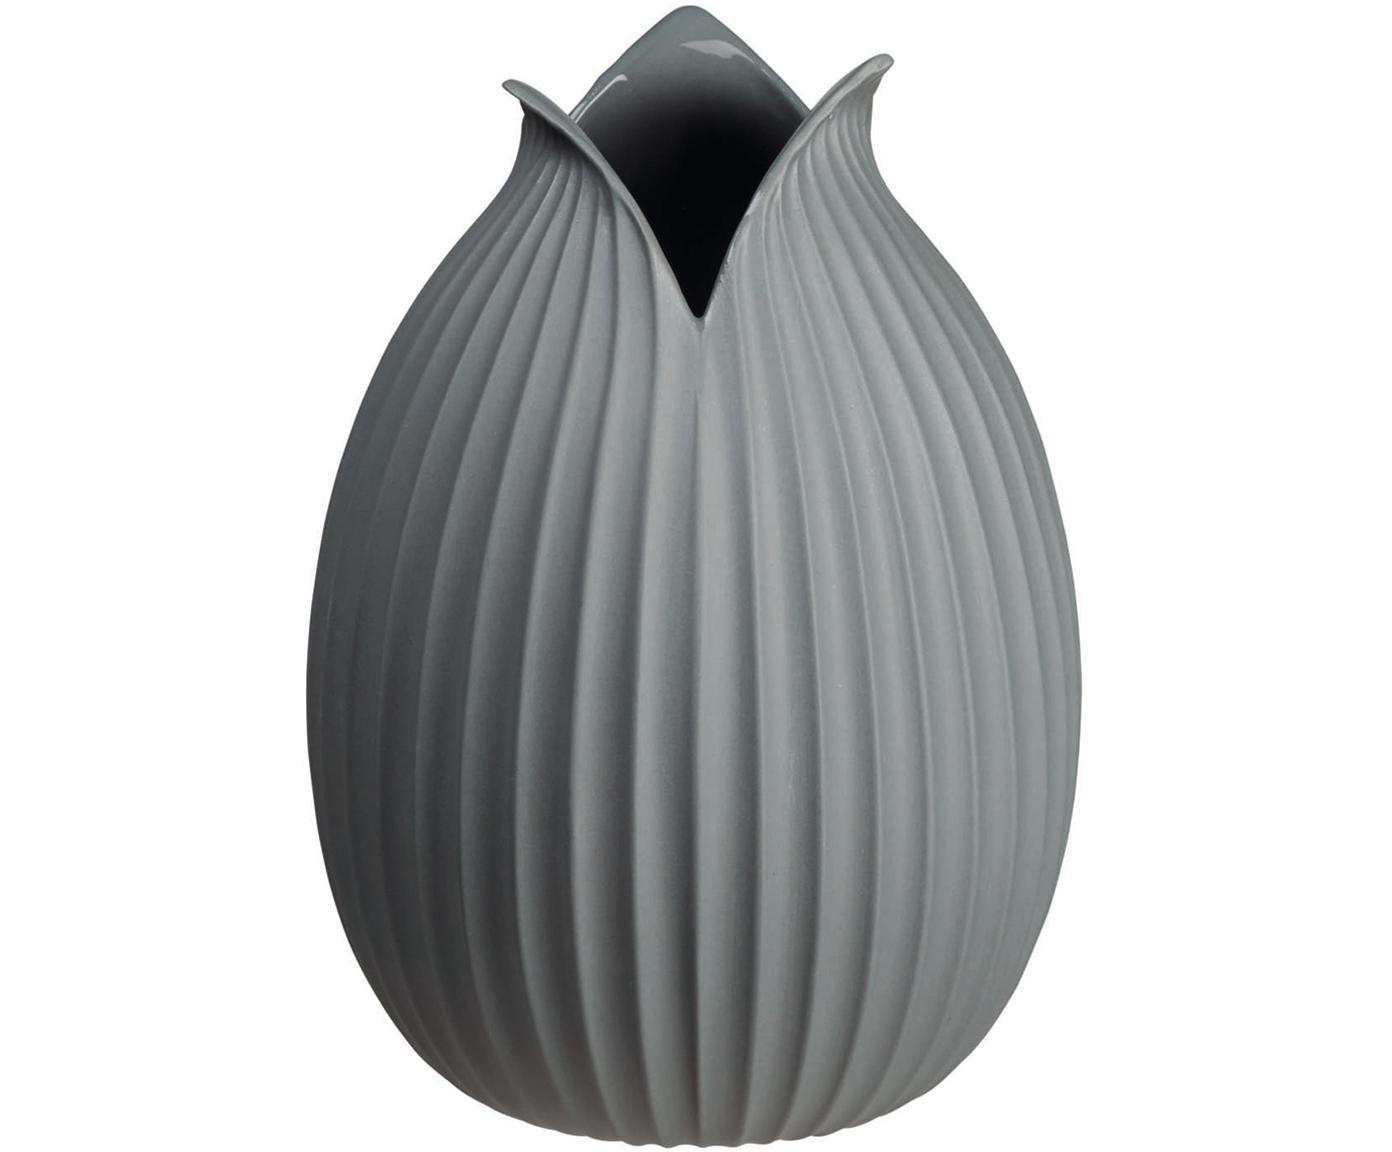 Handgefertigte Vase Yoko aus Porzellan, Porzellan, Grau, Ø 15 x H 22 cm